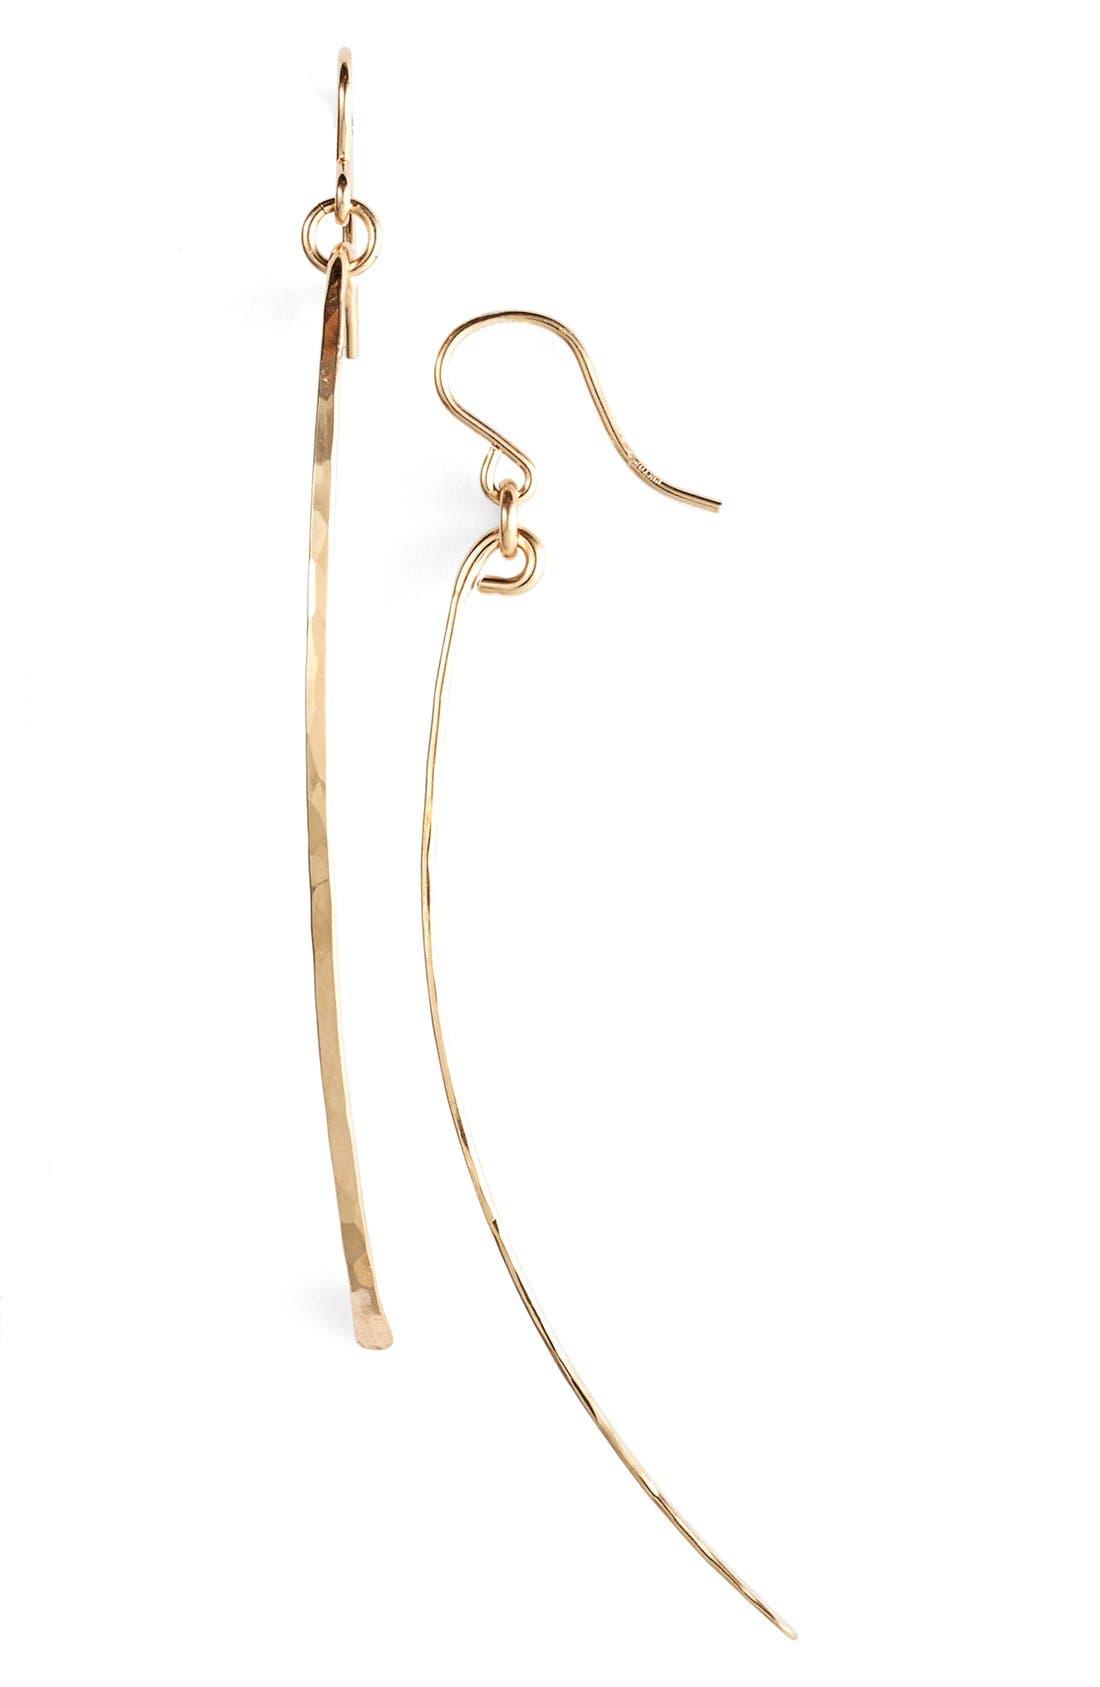 Ija Twig Drop Earrings,                         Main,                         color, 14K GOLD FILL